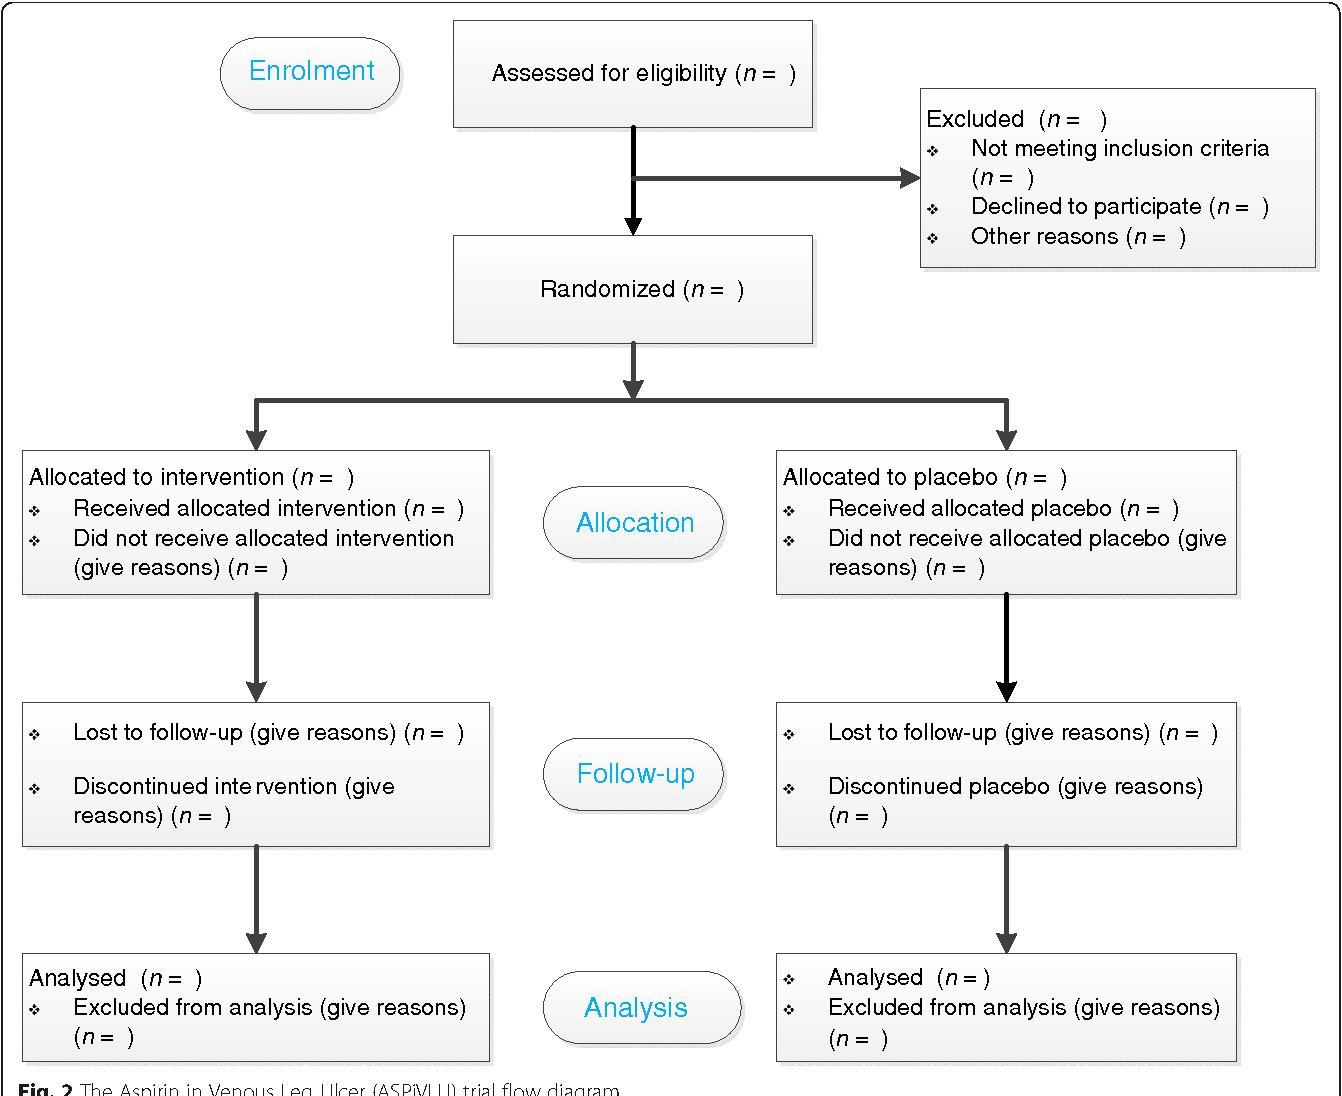 hight resolution of 2 the aspirin in venous leg ulcer aspivlu trial flow diagram